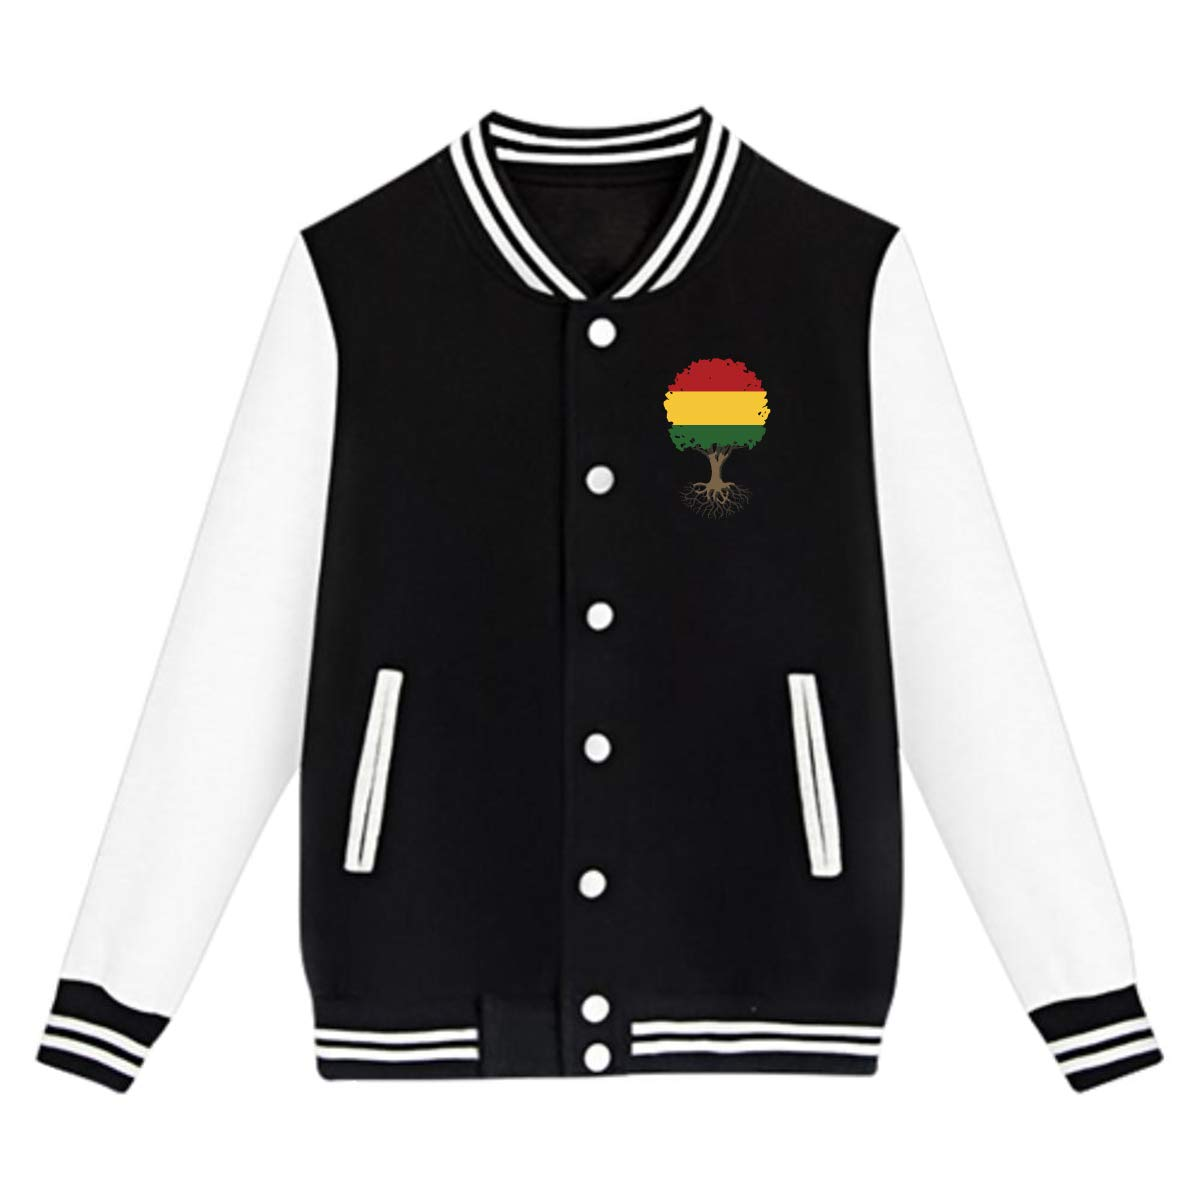 NJKM5MJ Unisex Teen Baseball Uniform Jacket Tree of Life with Rasta Flag Sweater Sport Coat